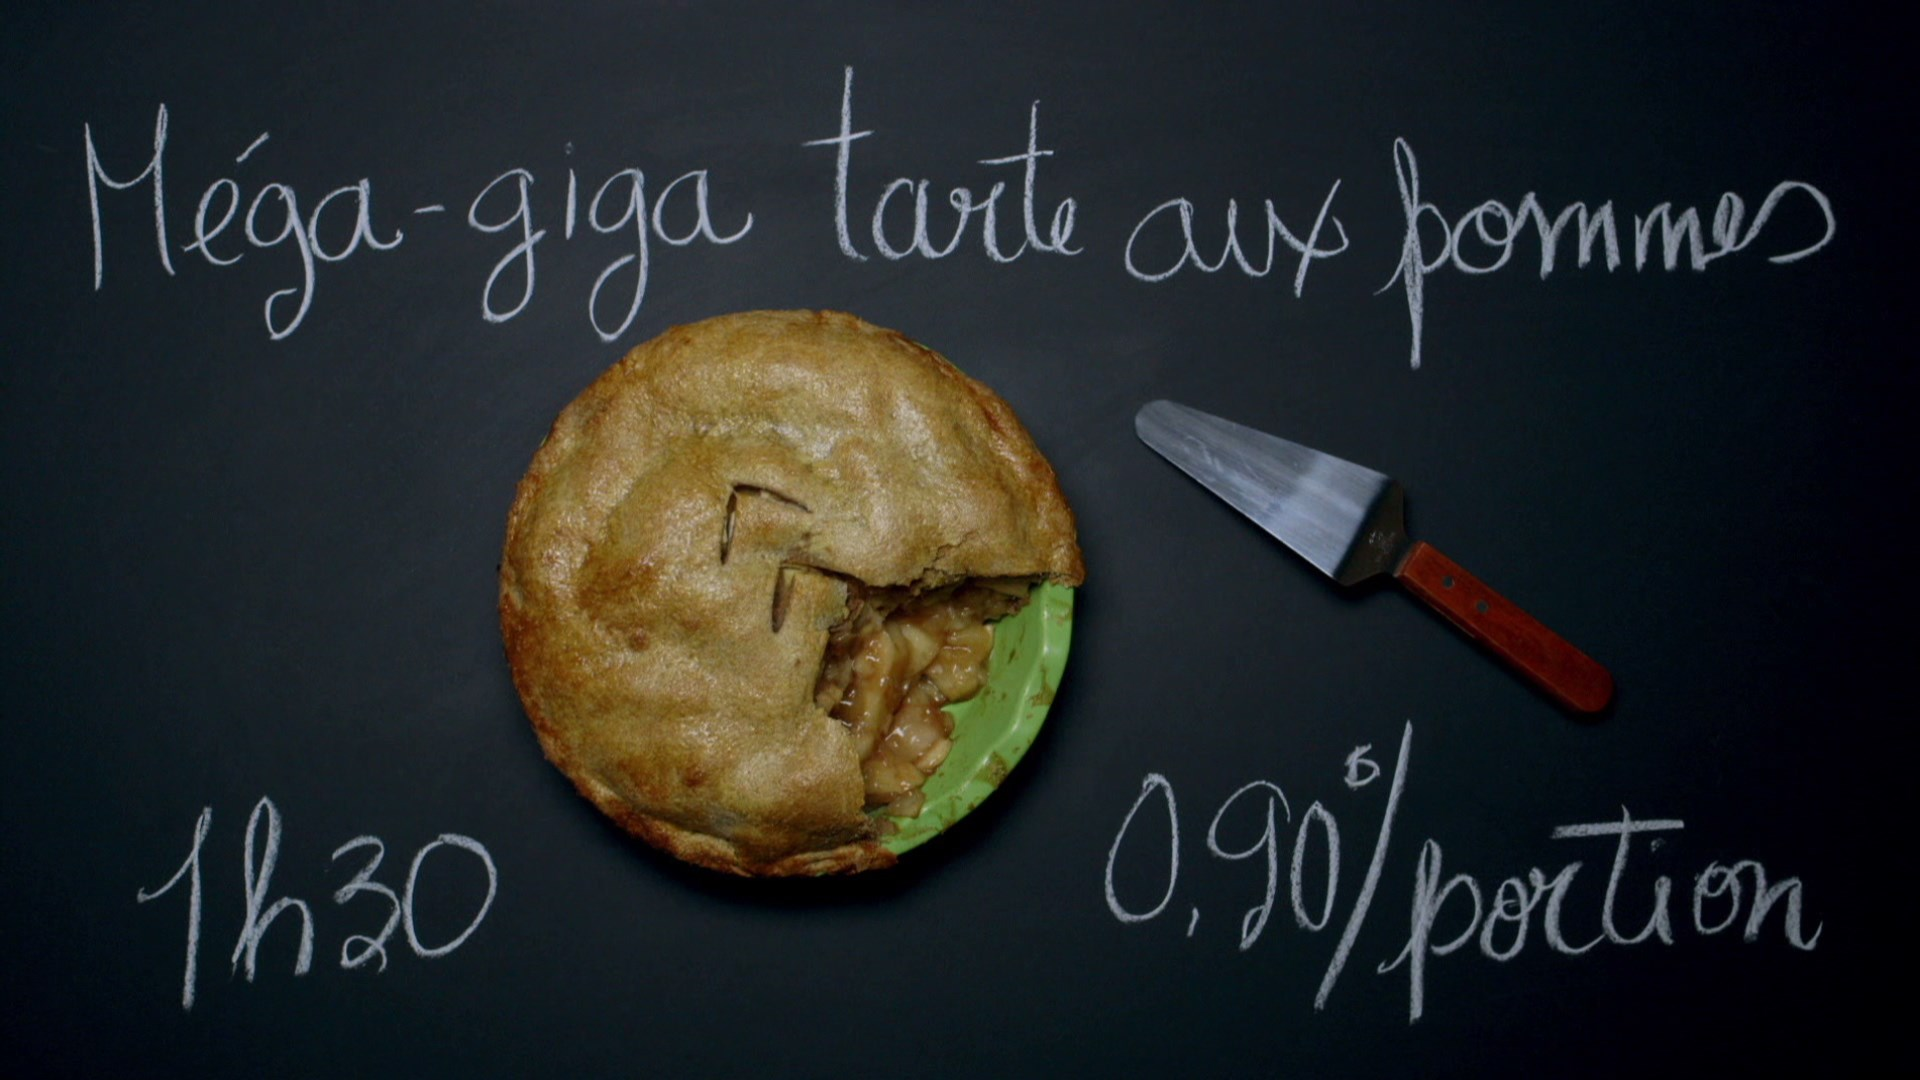 m 233 ga giga tarte aux pommes cuisine fut 233 e parents press 233 s zone vid 233 o t 233 l 233 qu 233 bec